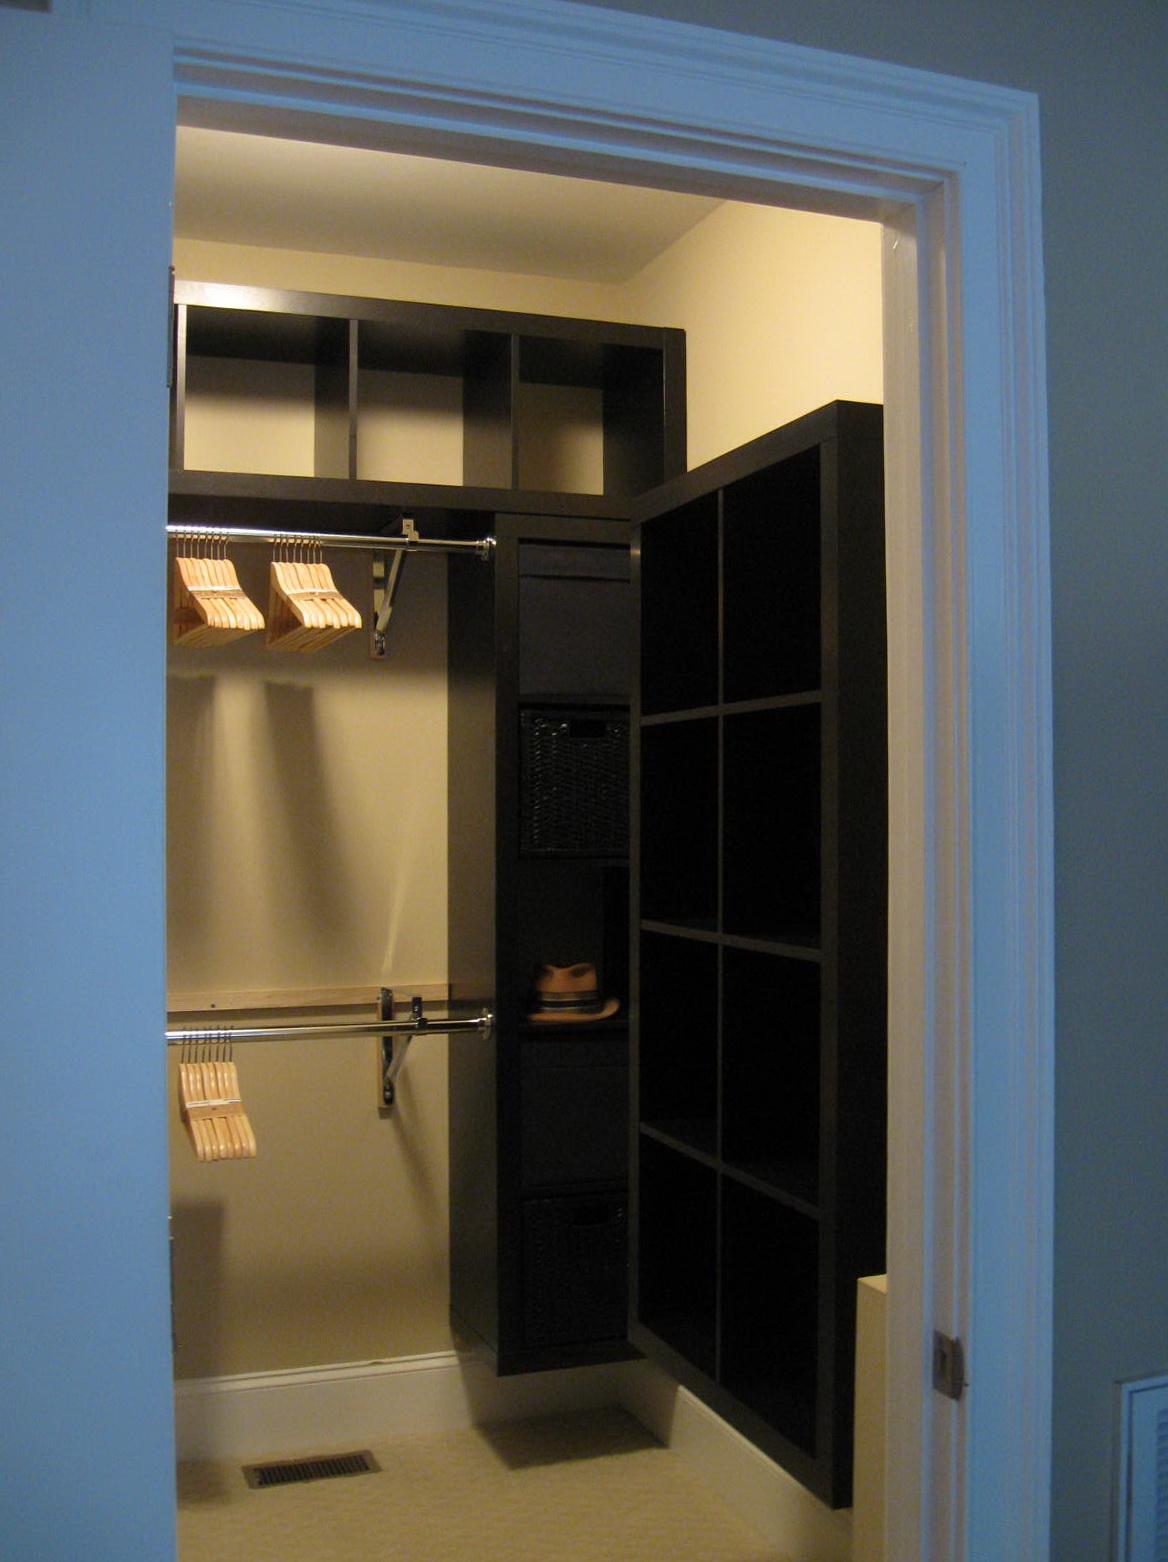 h within ikea interior in cabinet white select wardrobe mdf hampton bay amazing closet